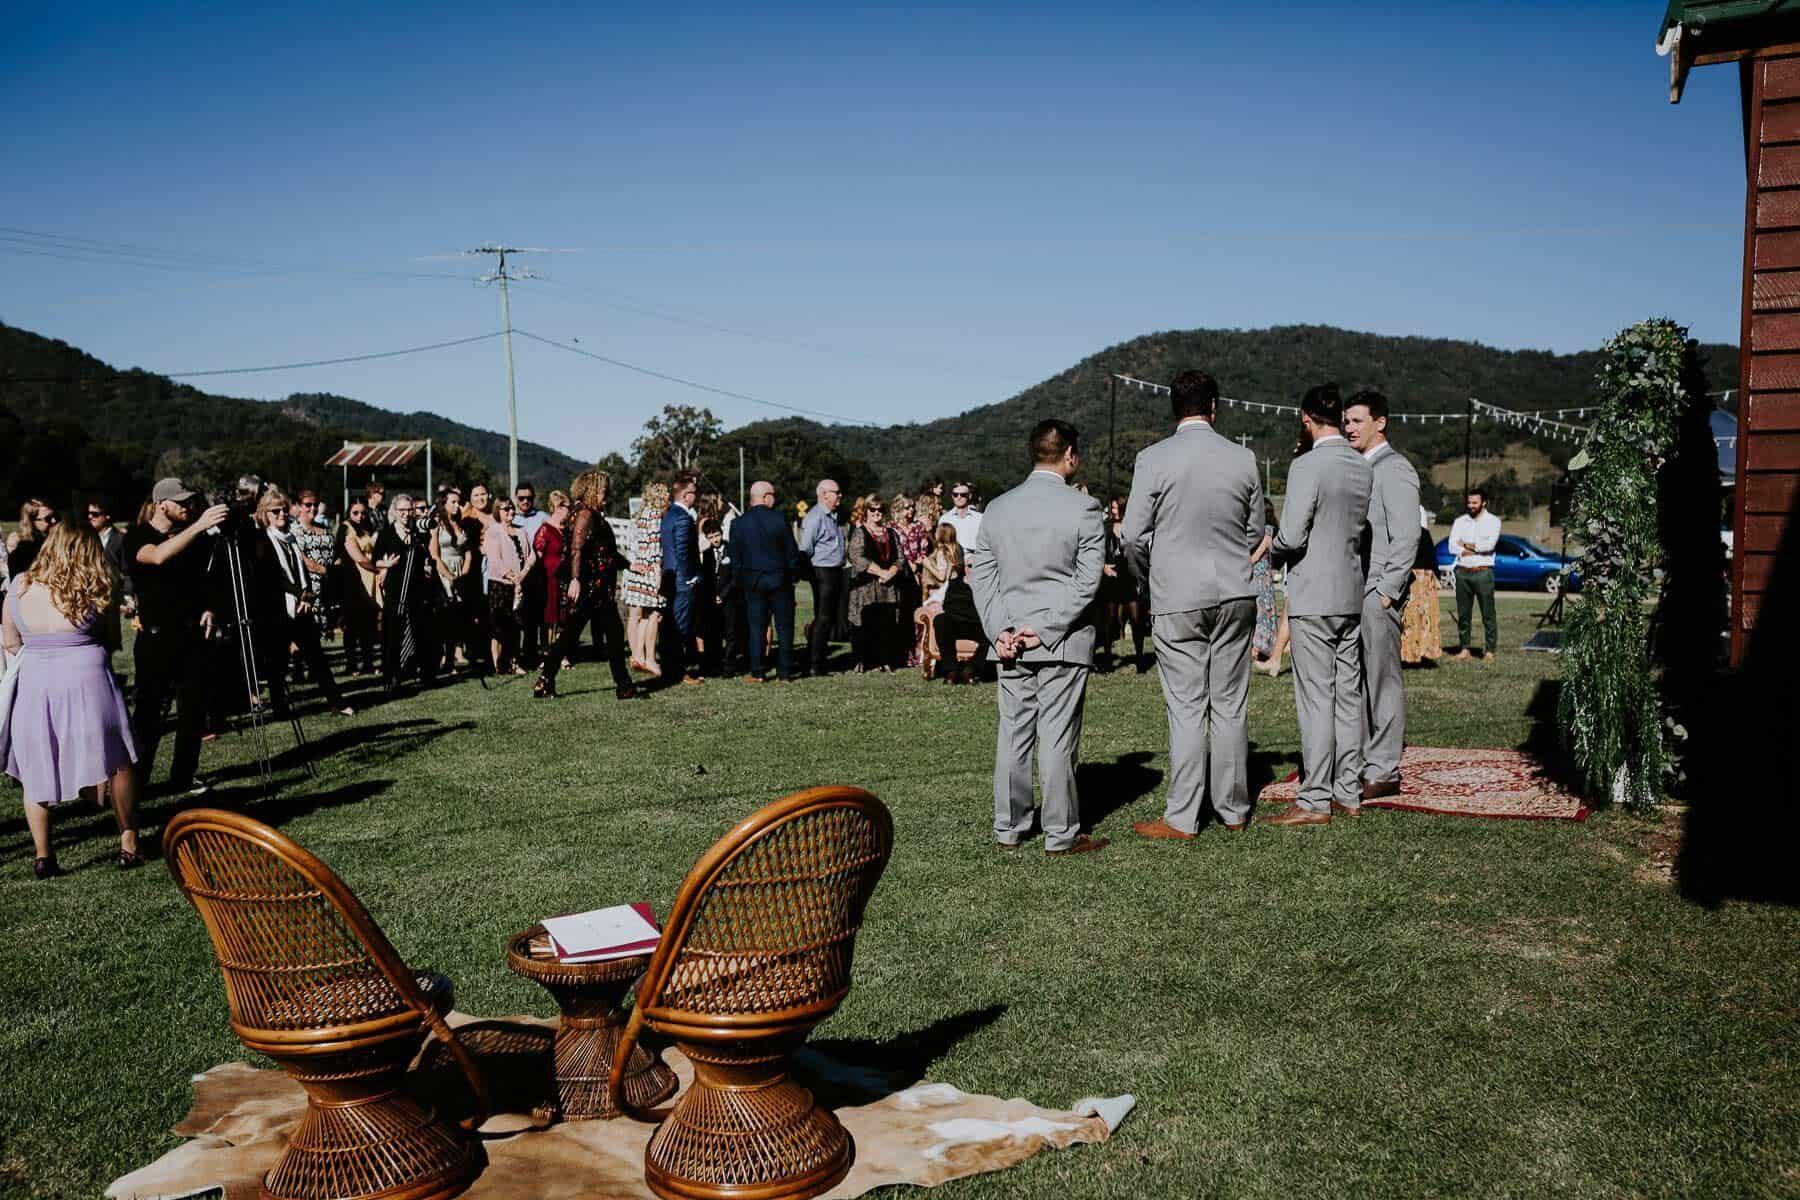 Low key Sunshine Coast wedding at the Obi Obi Hall